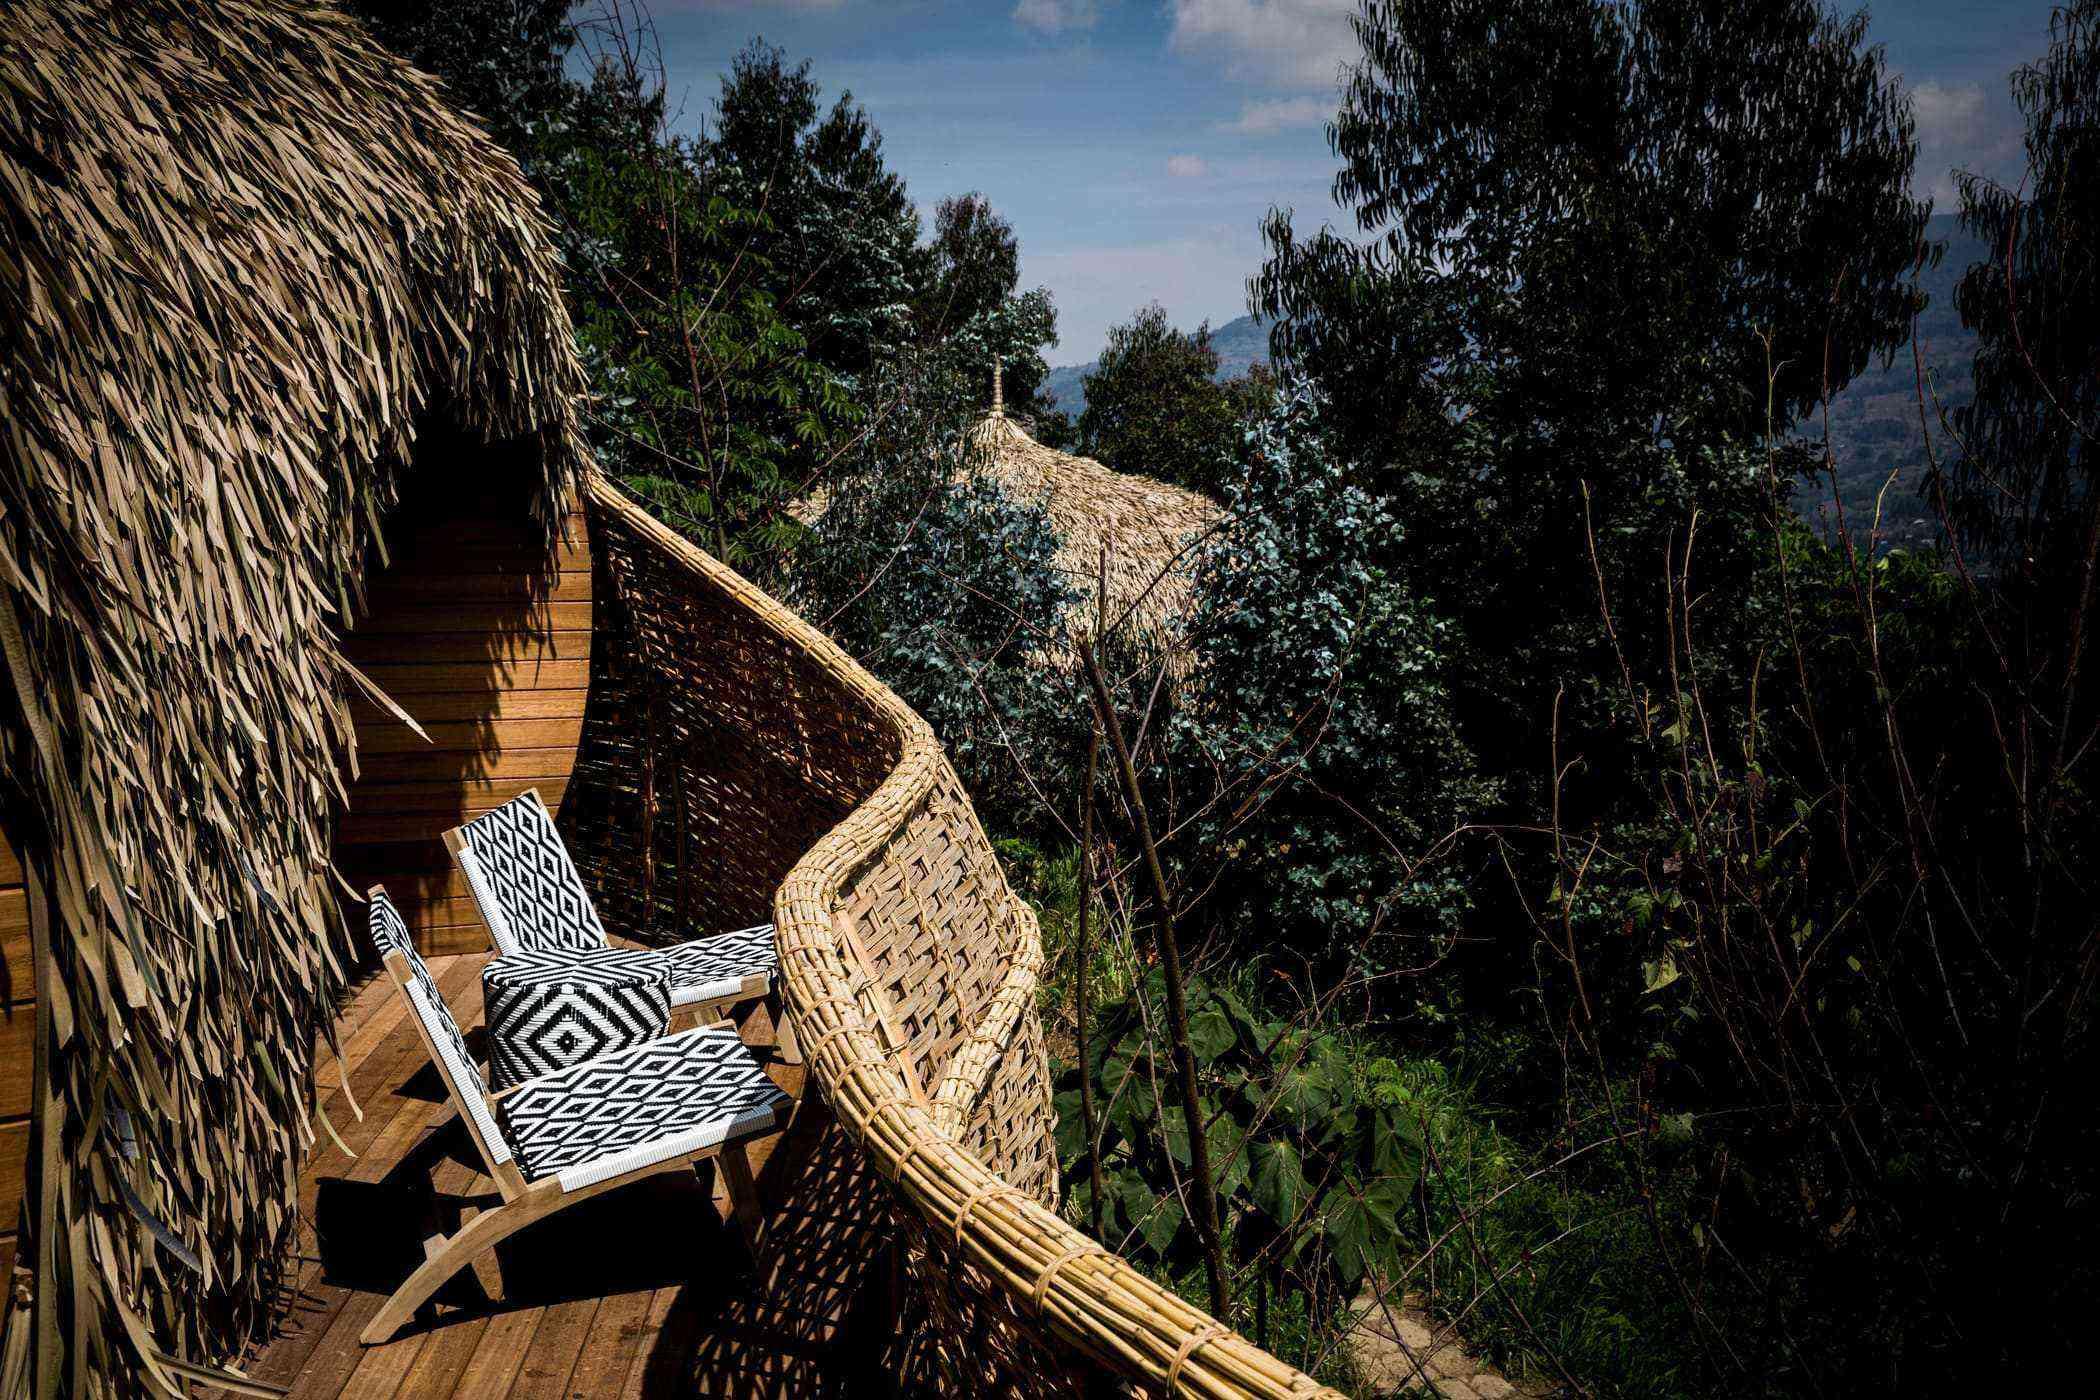 Treehouse02-Wilderness SafarisDavid Crookes